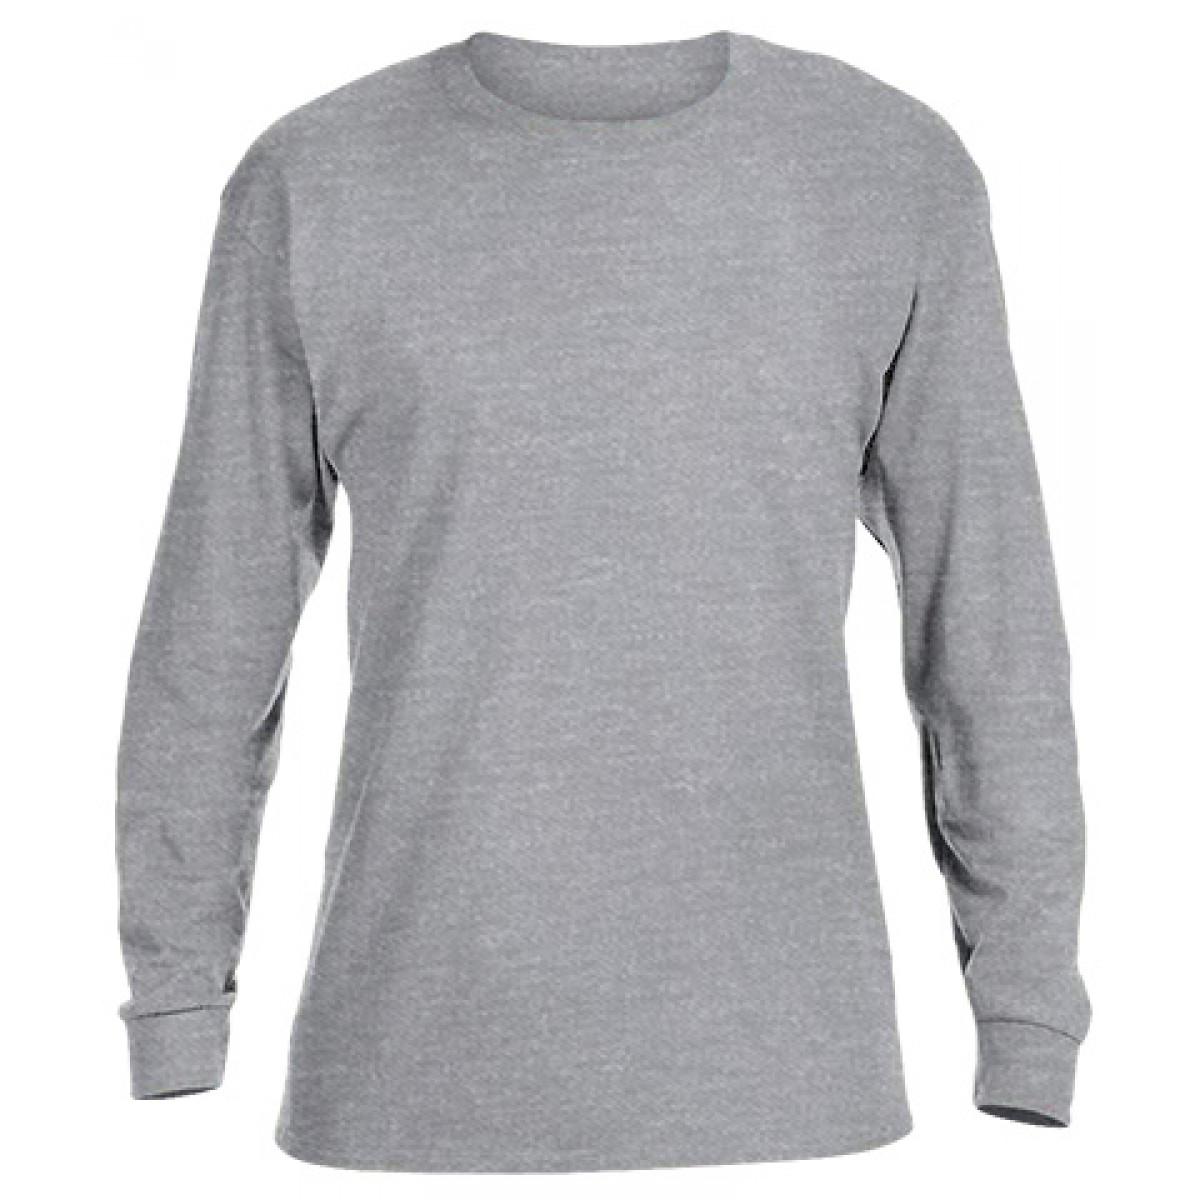 Basic Long Sleeve Crew Neck -Ash Gray-YM